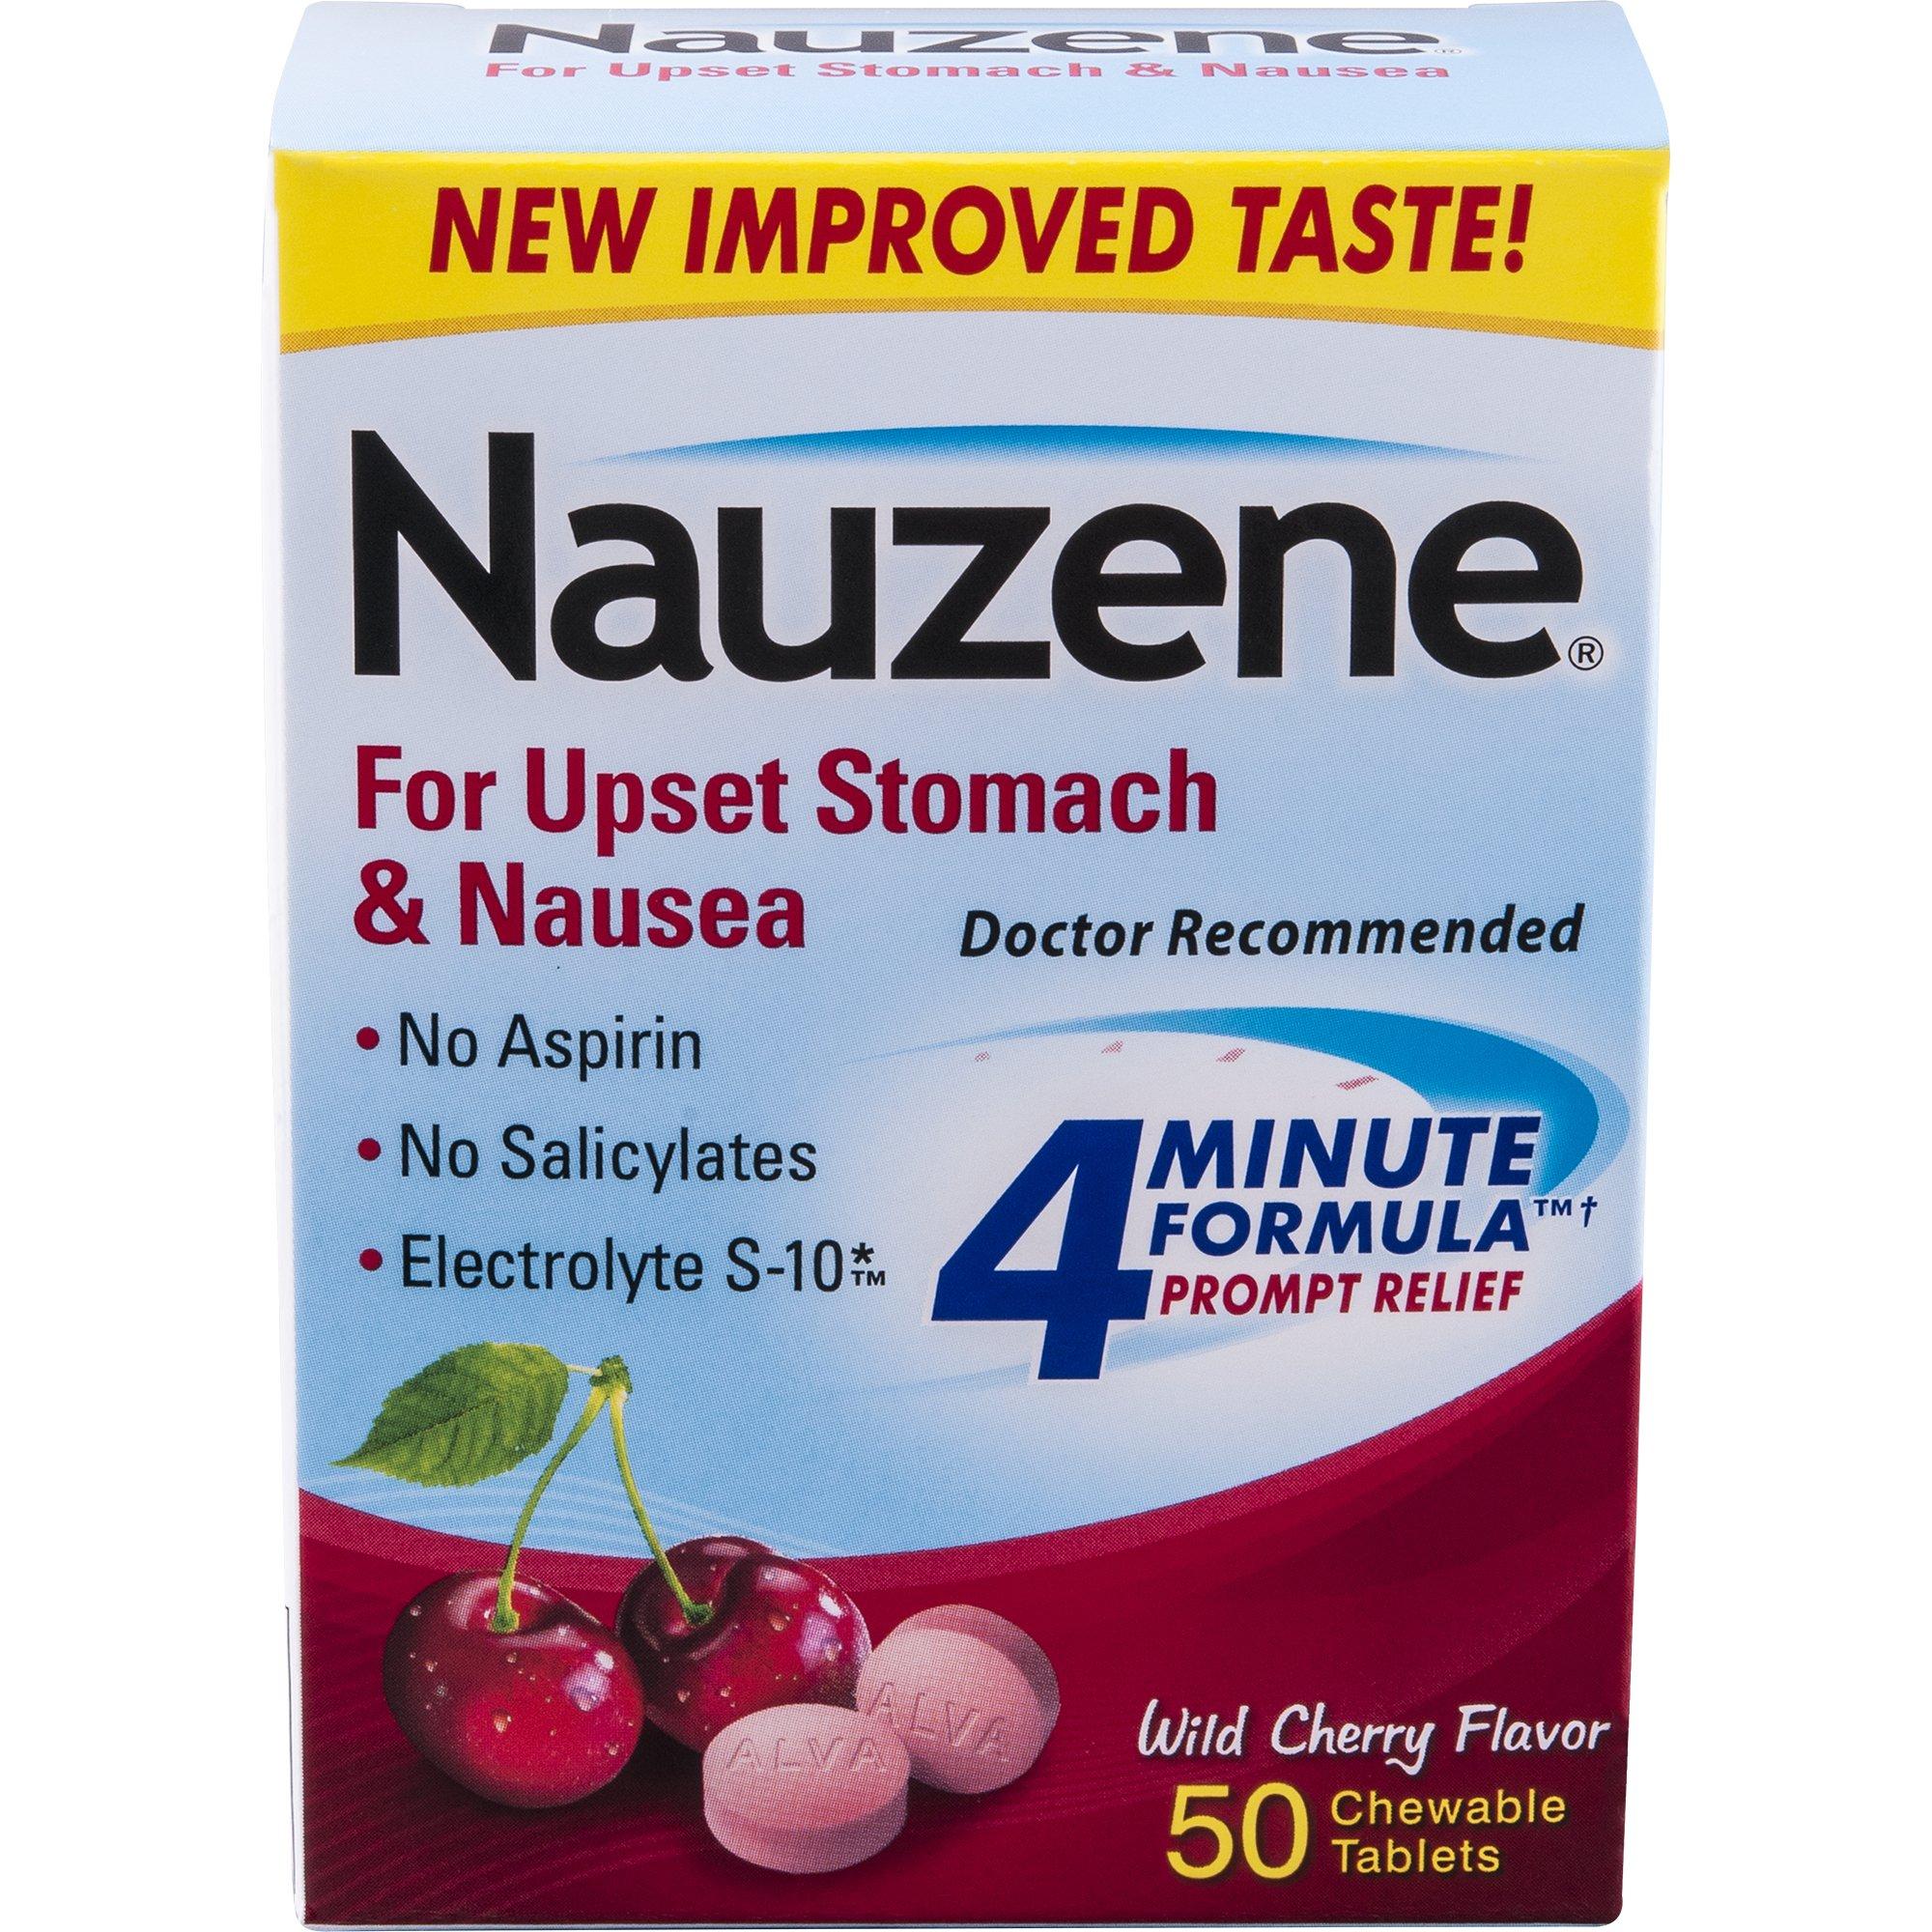 Nauzene For Nausea Chewable Tablets, Wild Cherry, 50 Count by Nauzene (Image #1)